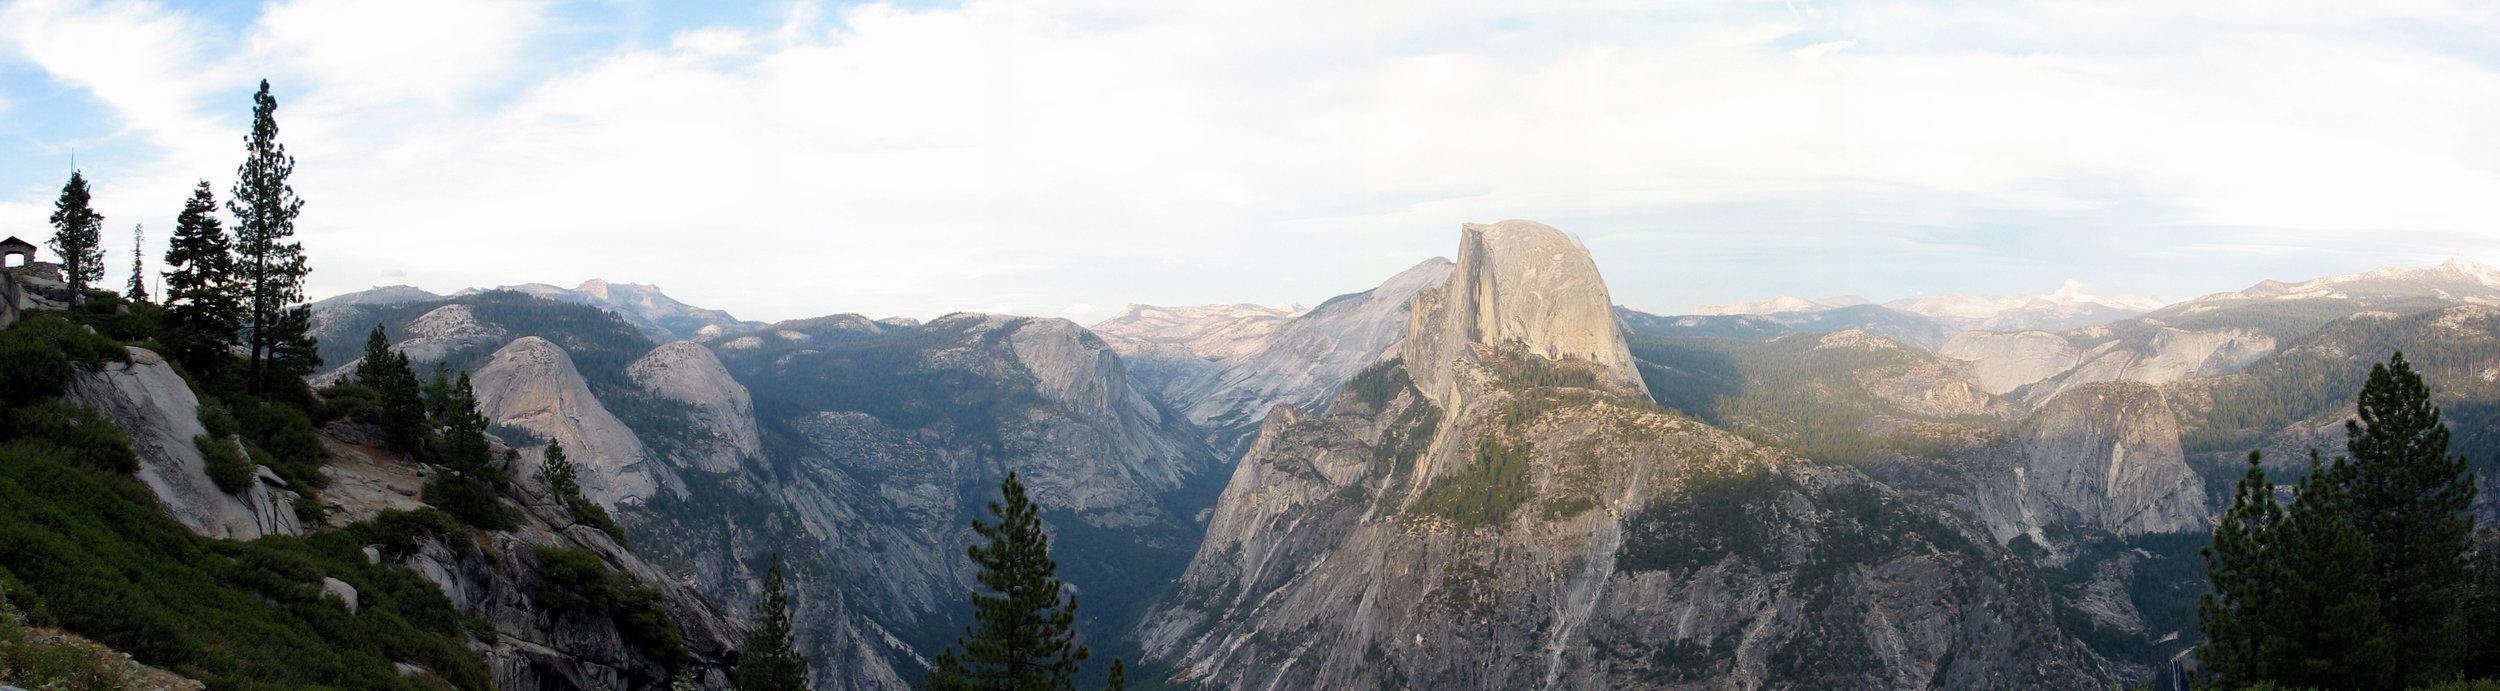 383982_9219 - California Yosemite.jpg